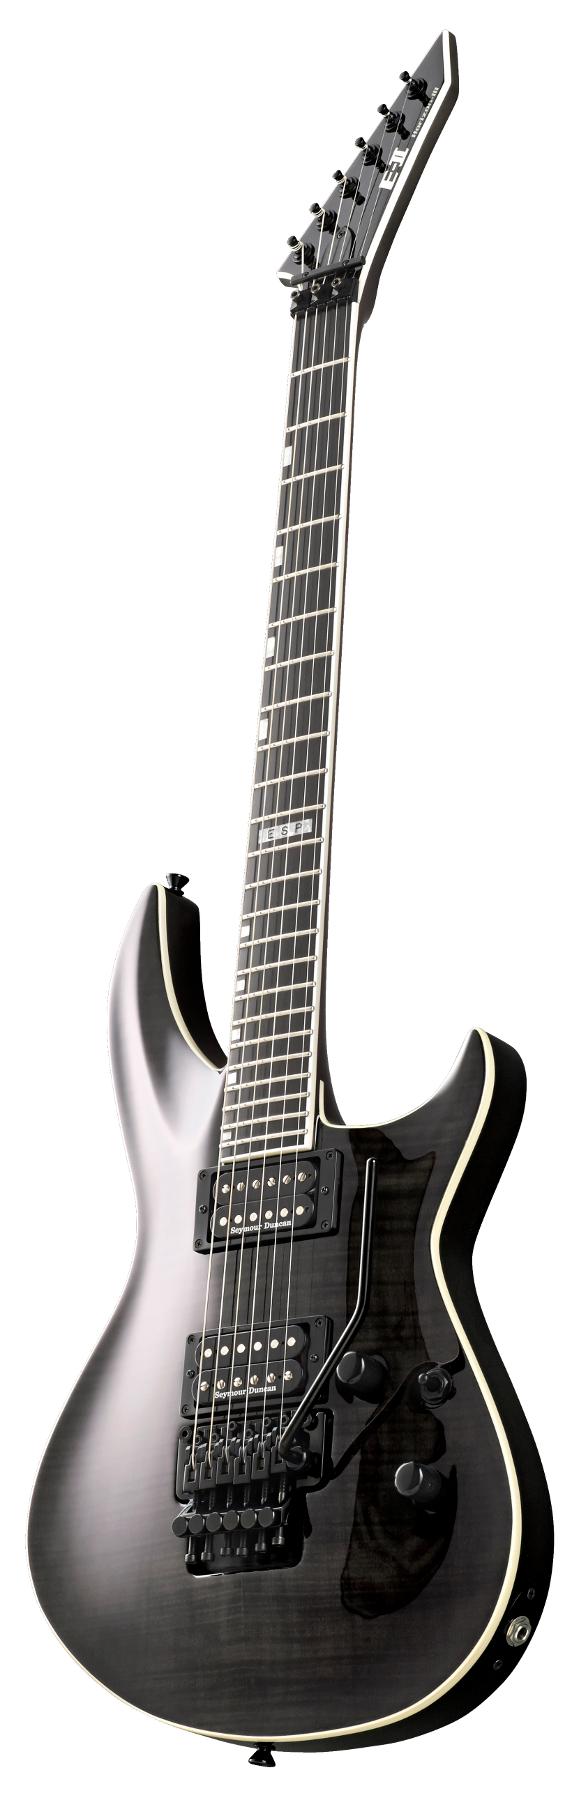 Electric Guitar, See-Thru Black